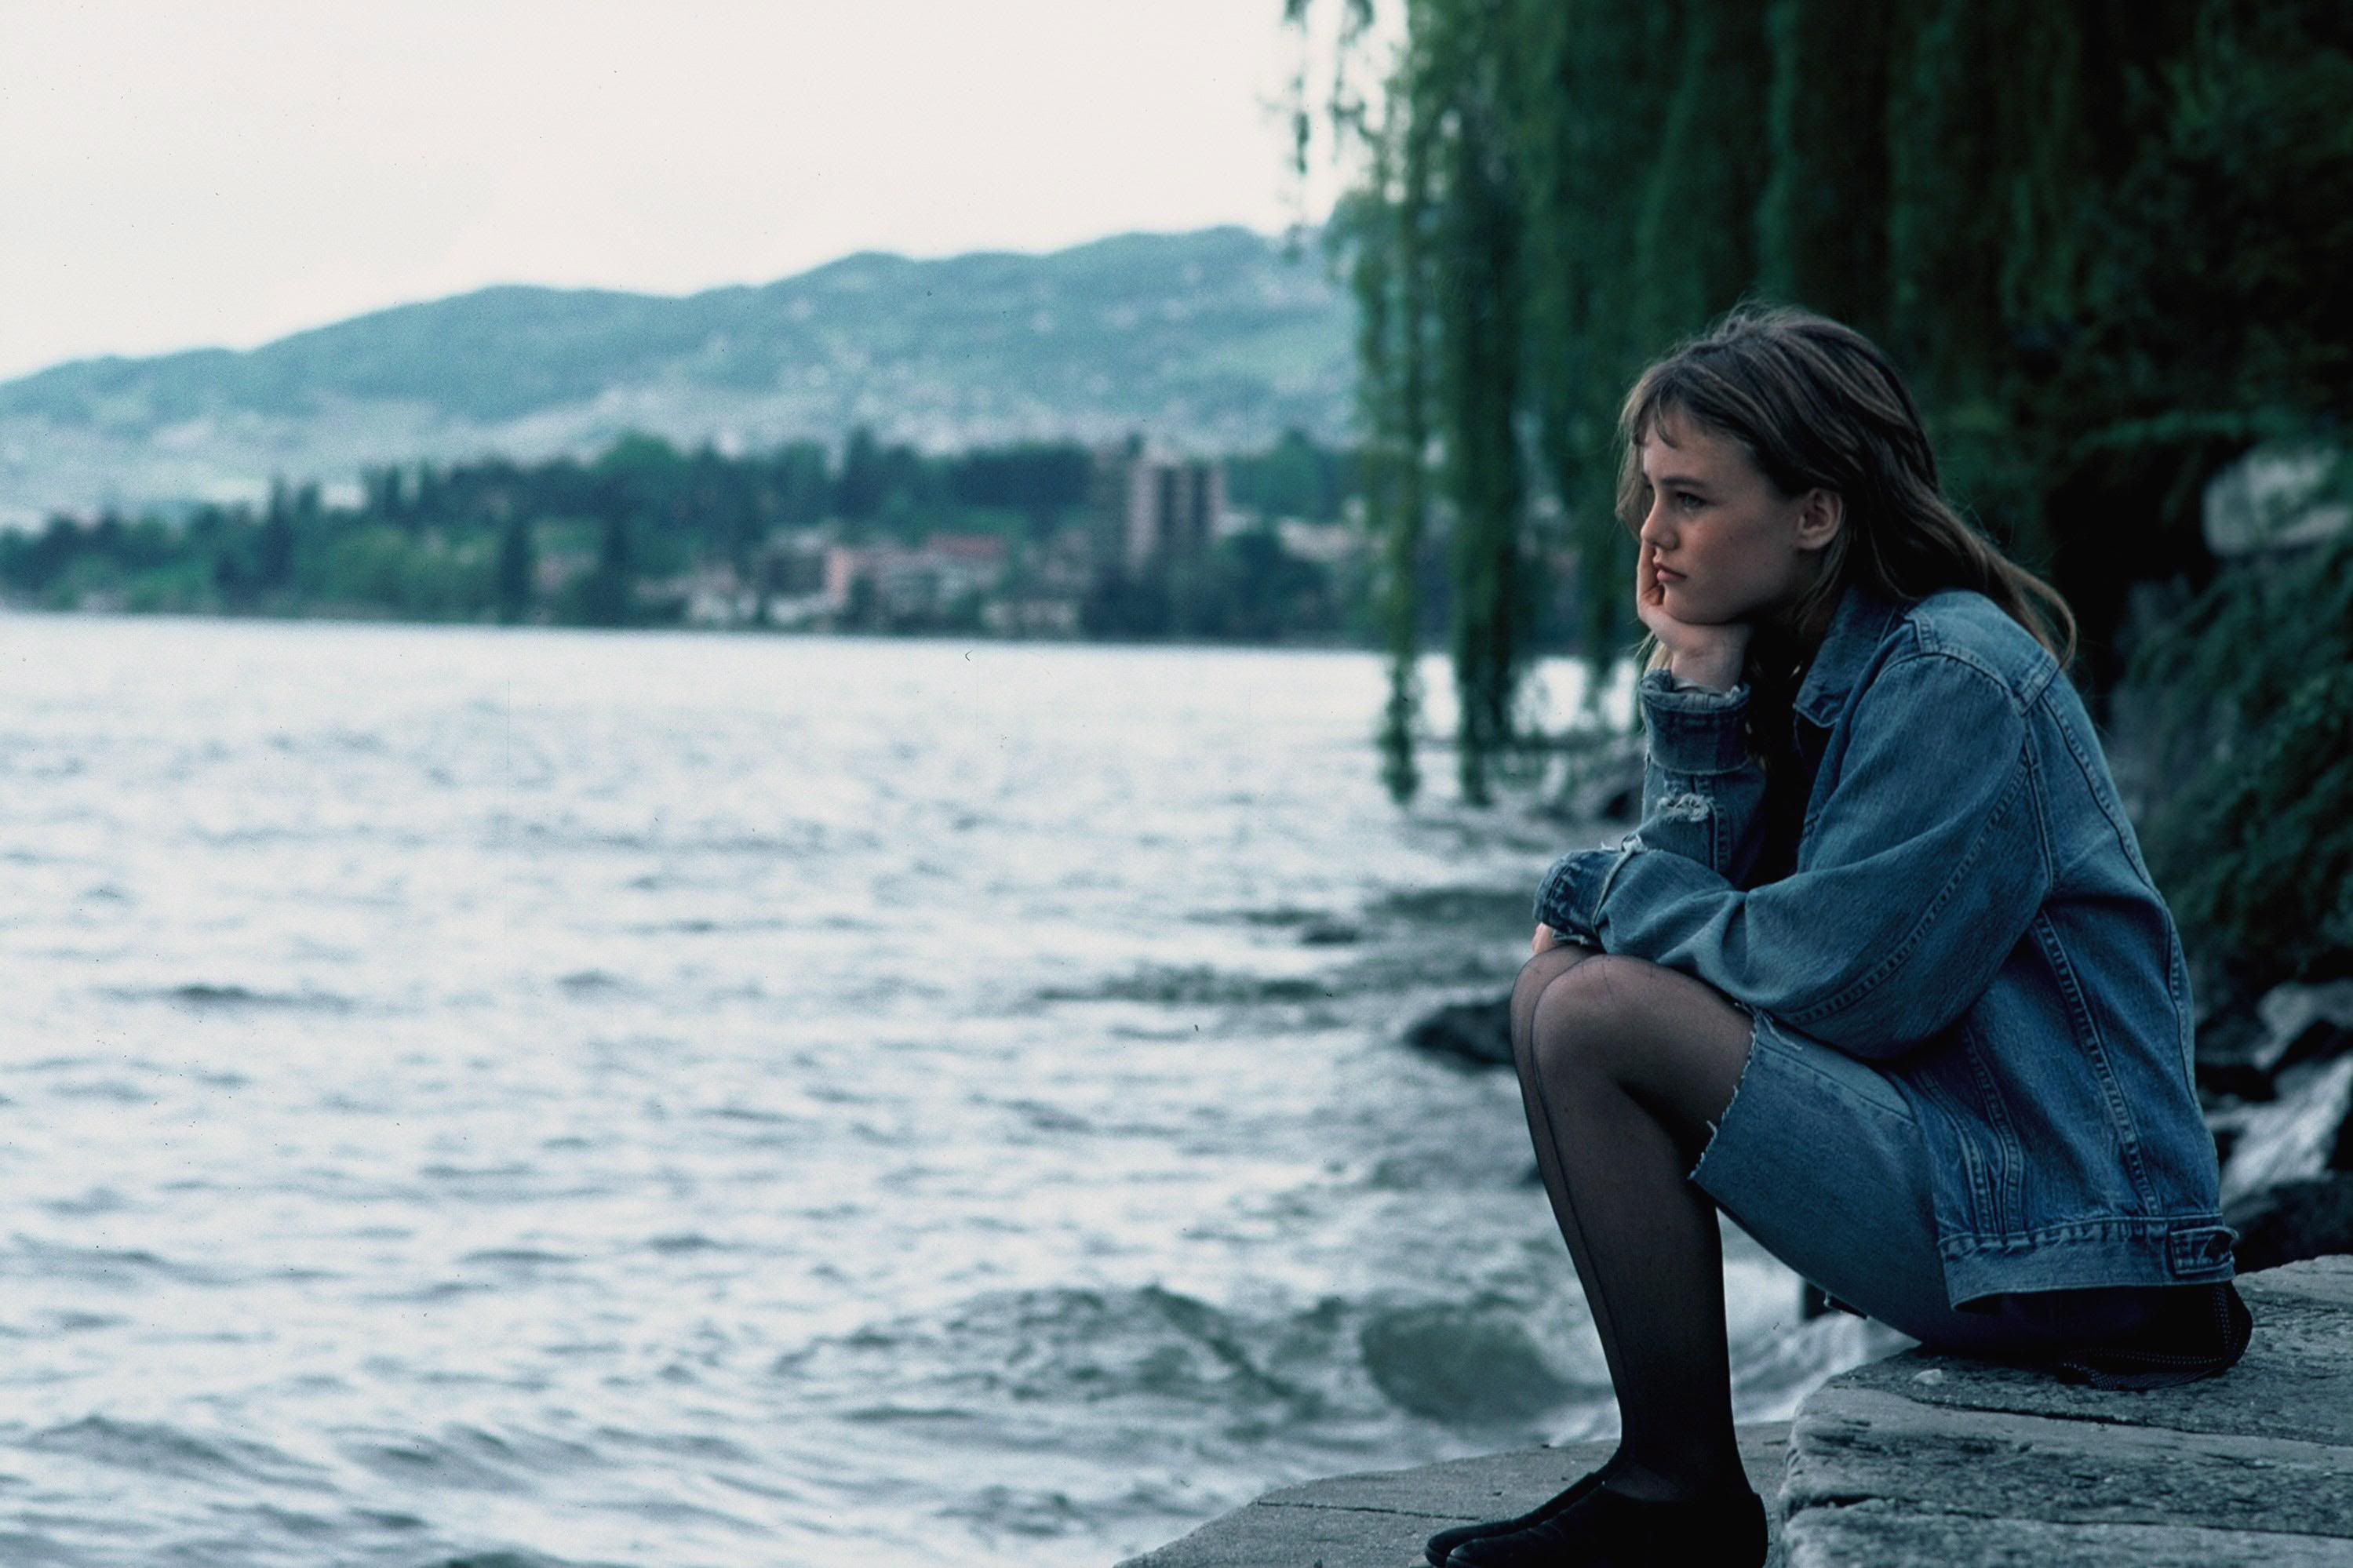 Pictures Of Vanessa Paradis